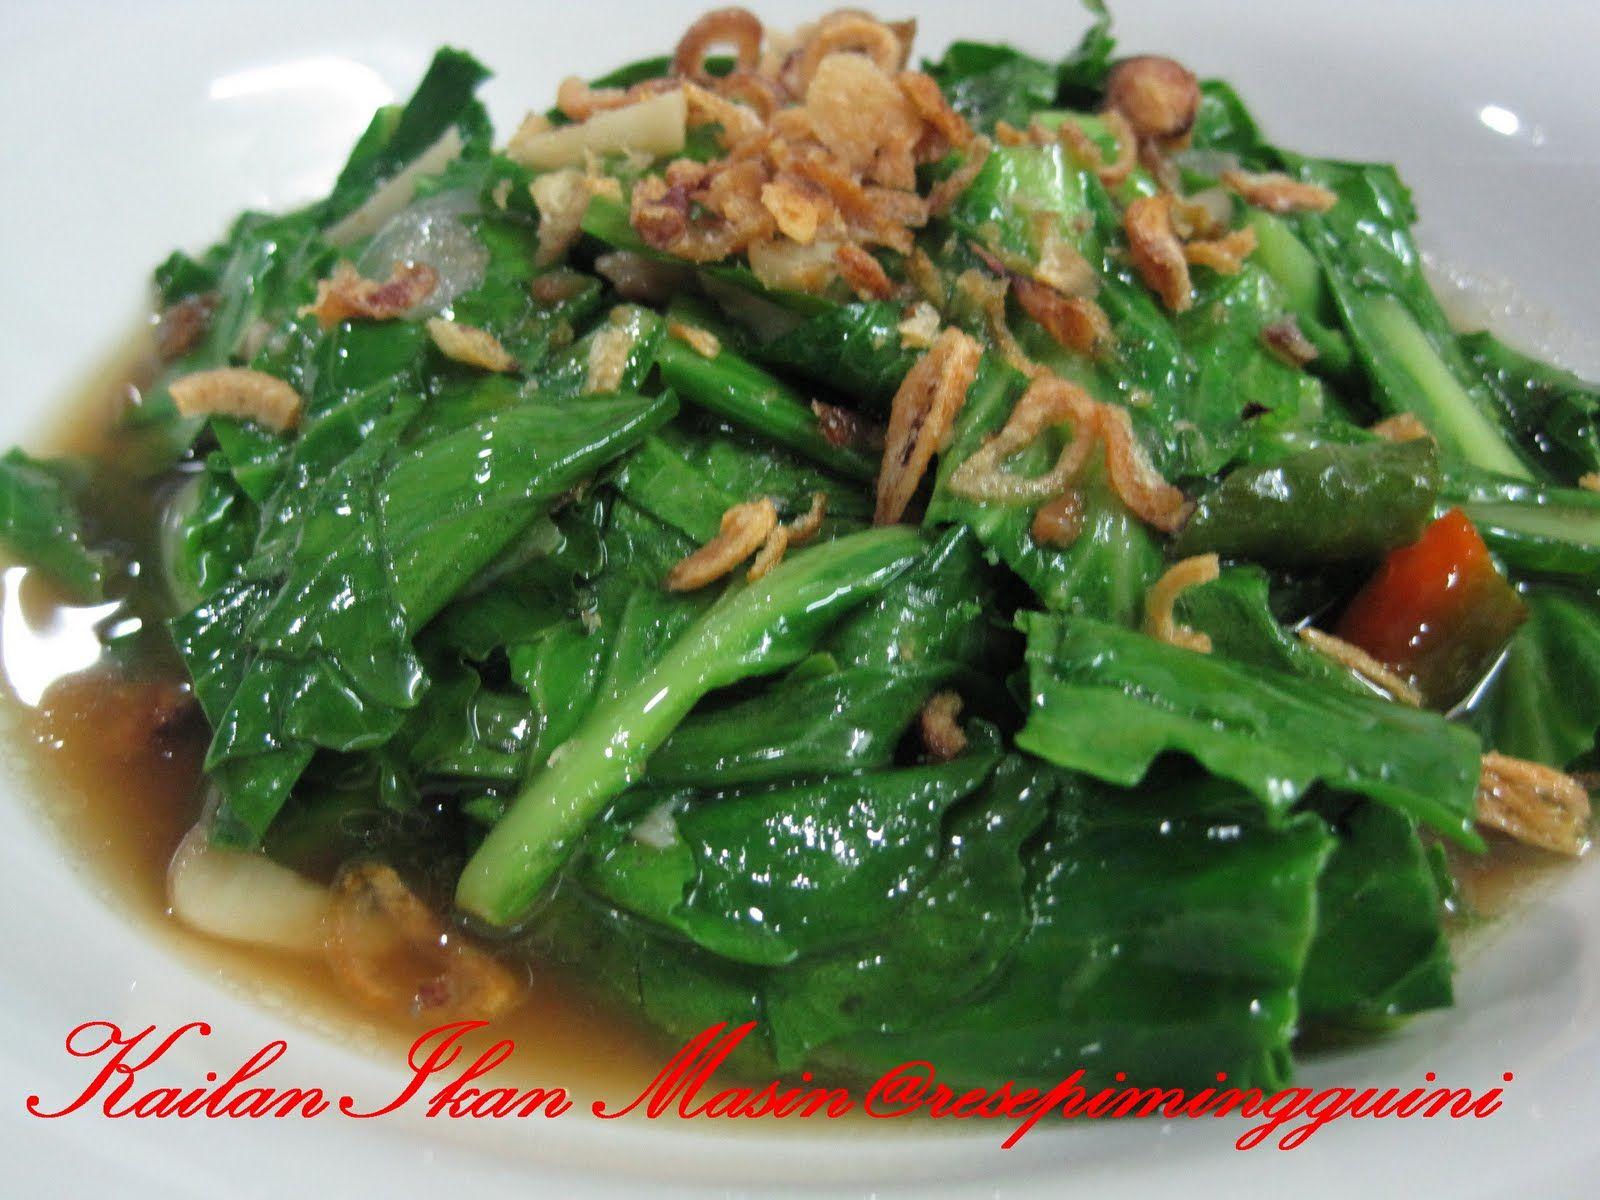 Kailan Ikan Masin Resepi Minggu Ini Resep Masakan Cina Makan Malam Masakan